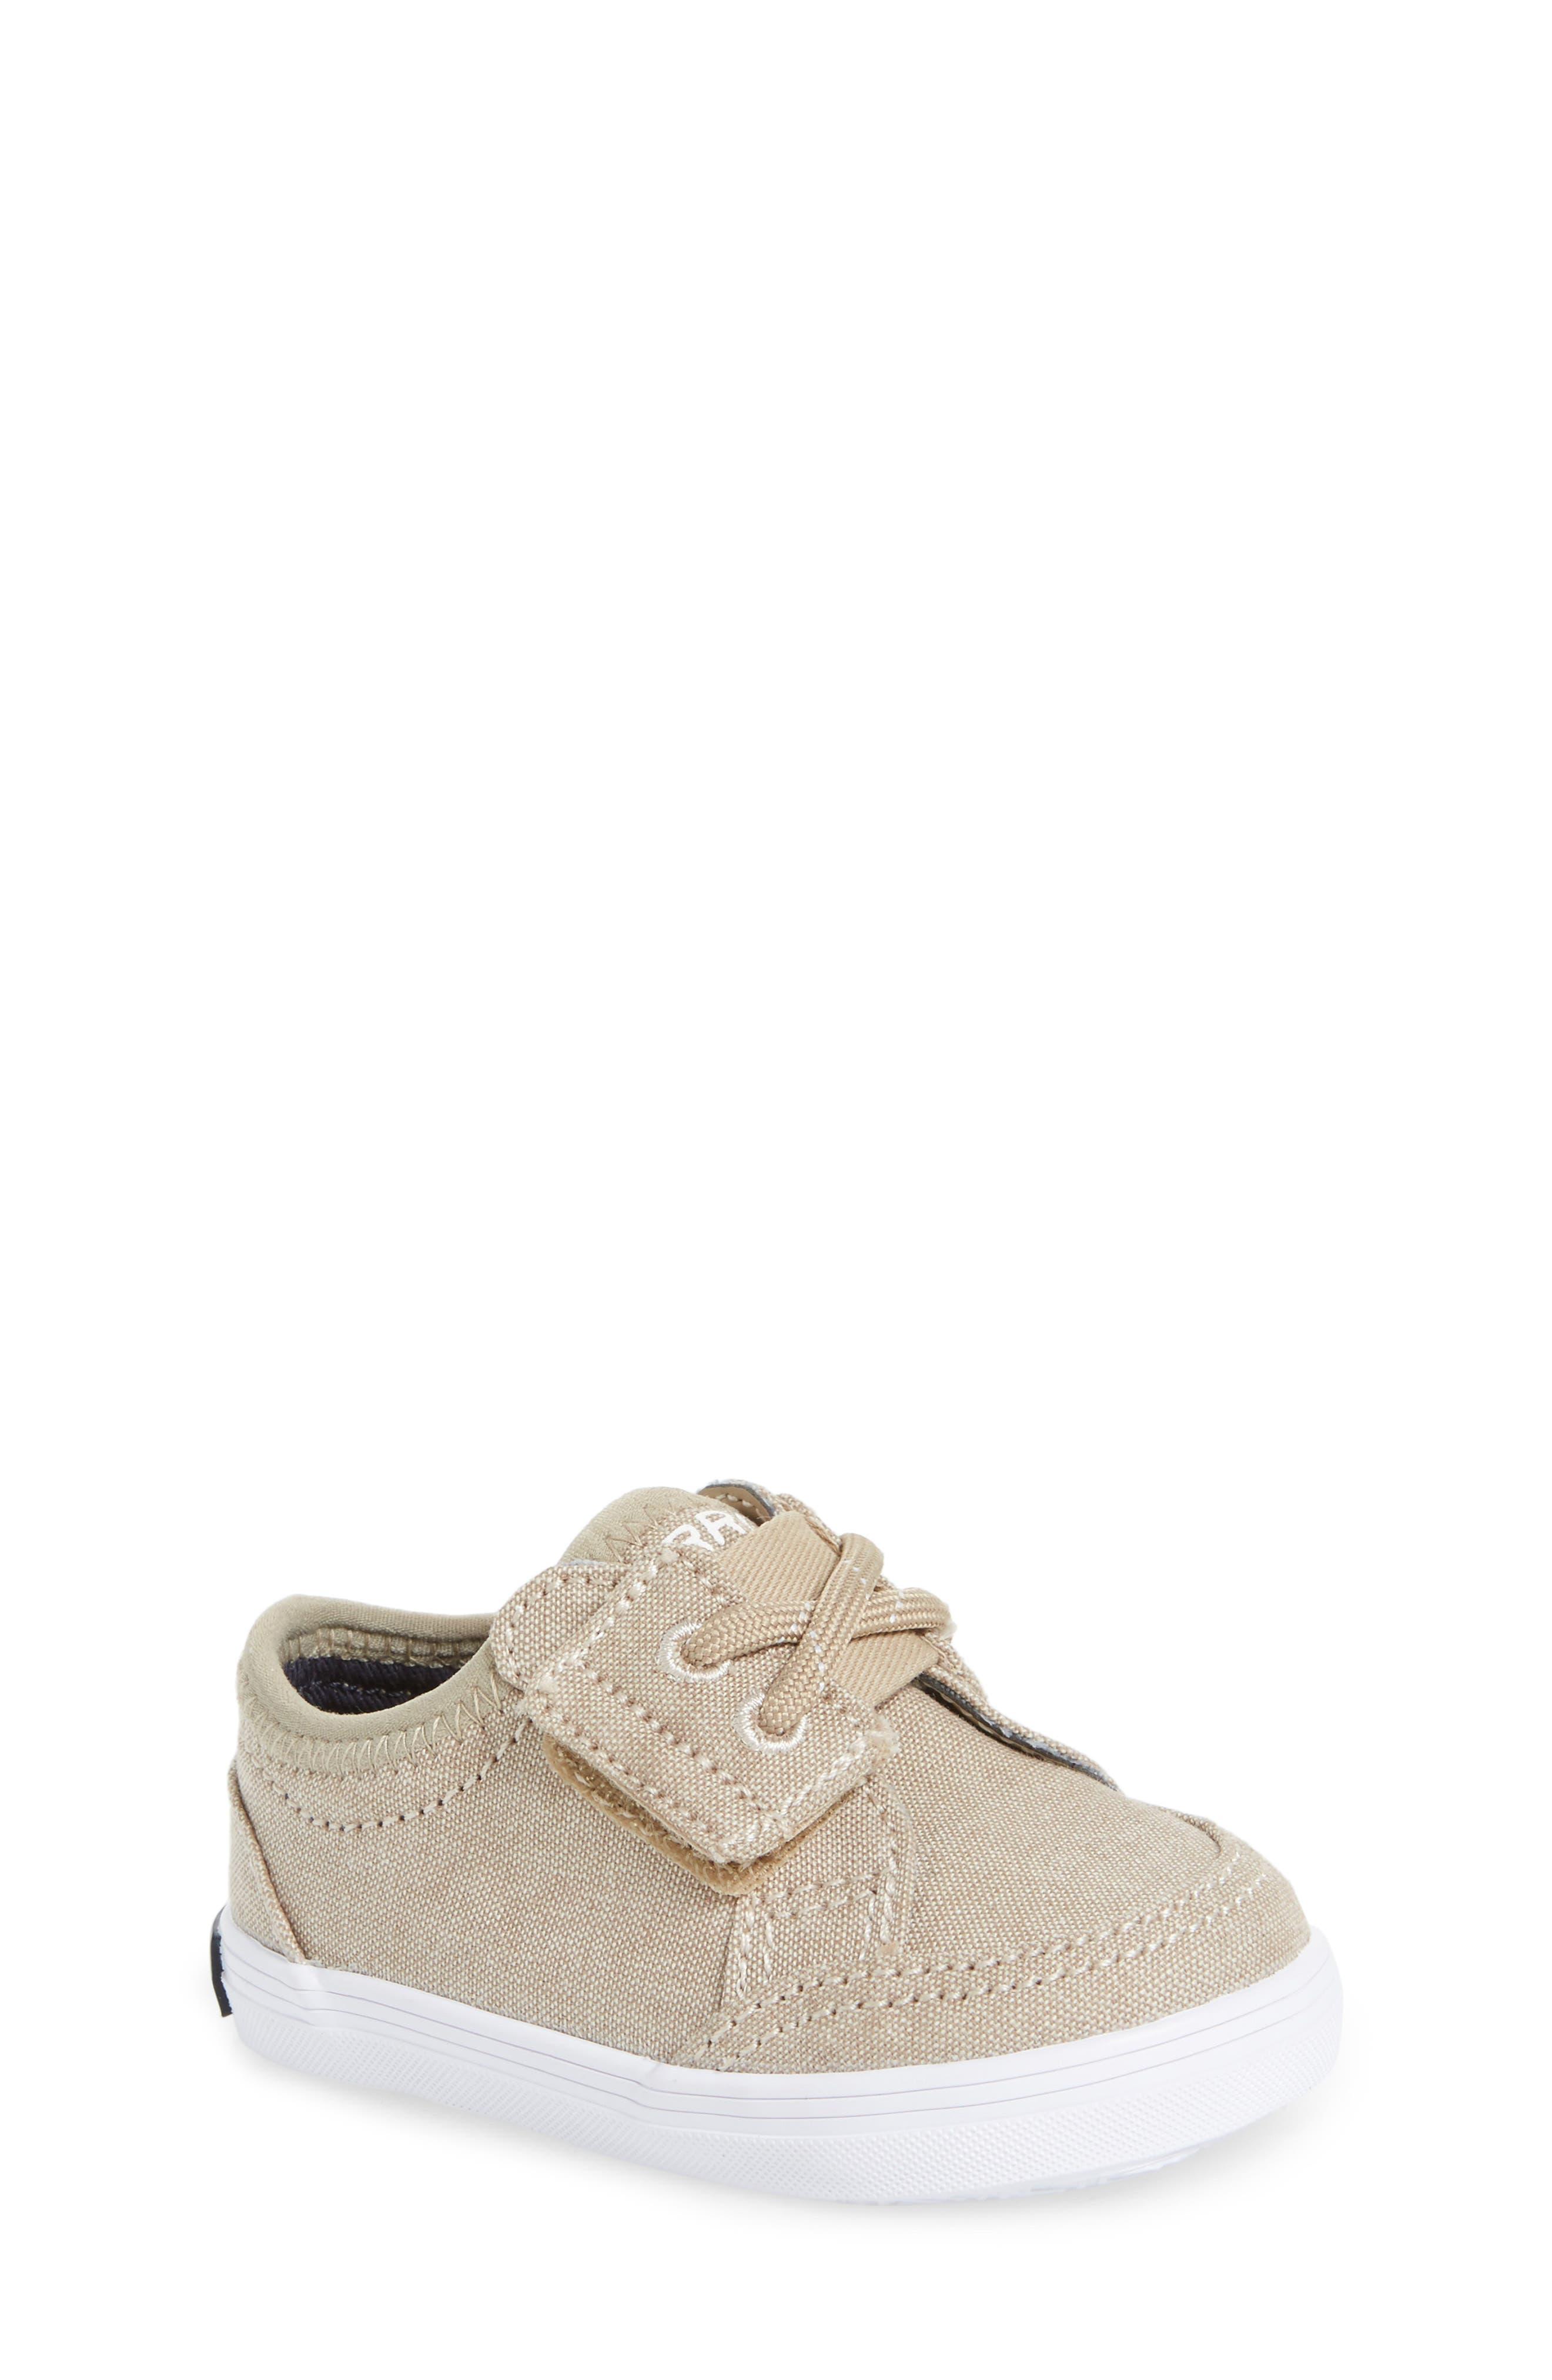 Deckfin Crib Jr. Sneaker,                         Main,                         color, Khaki